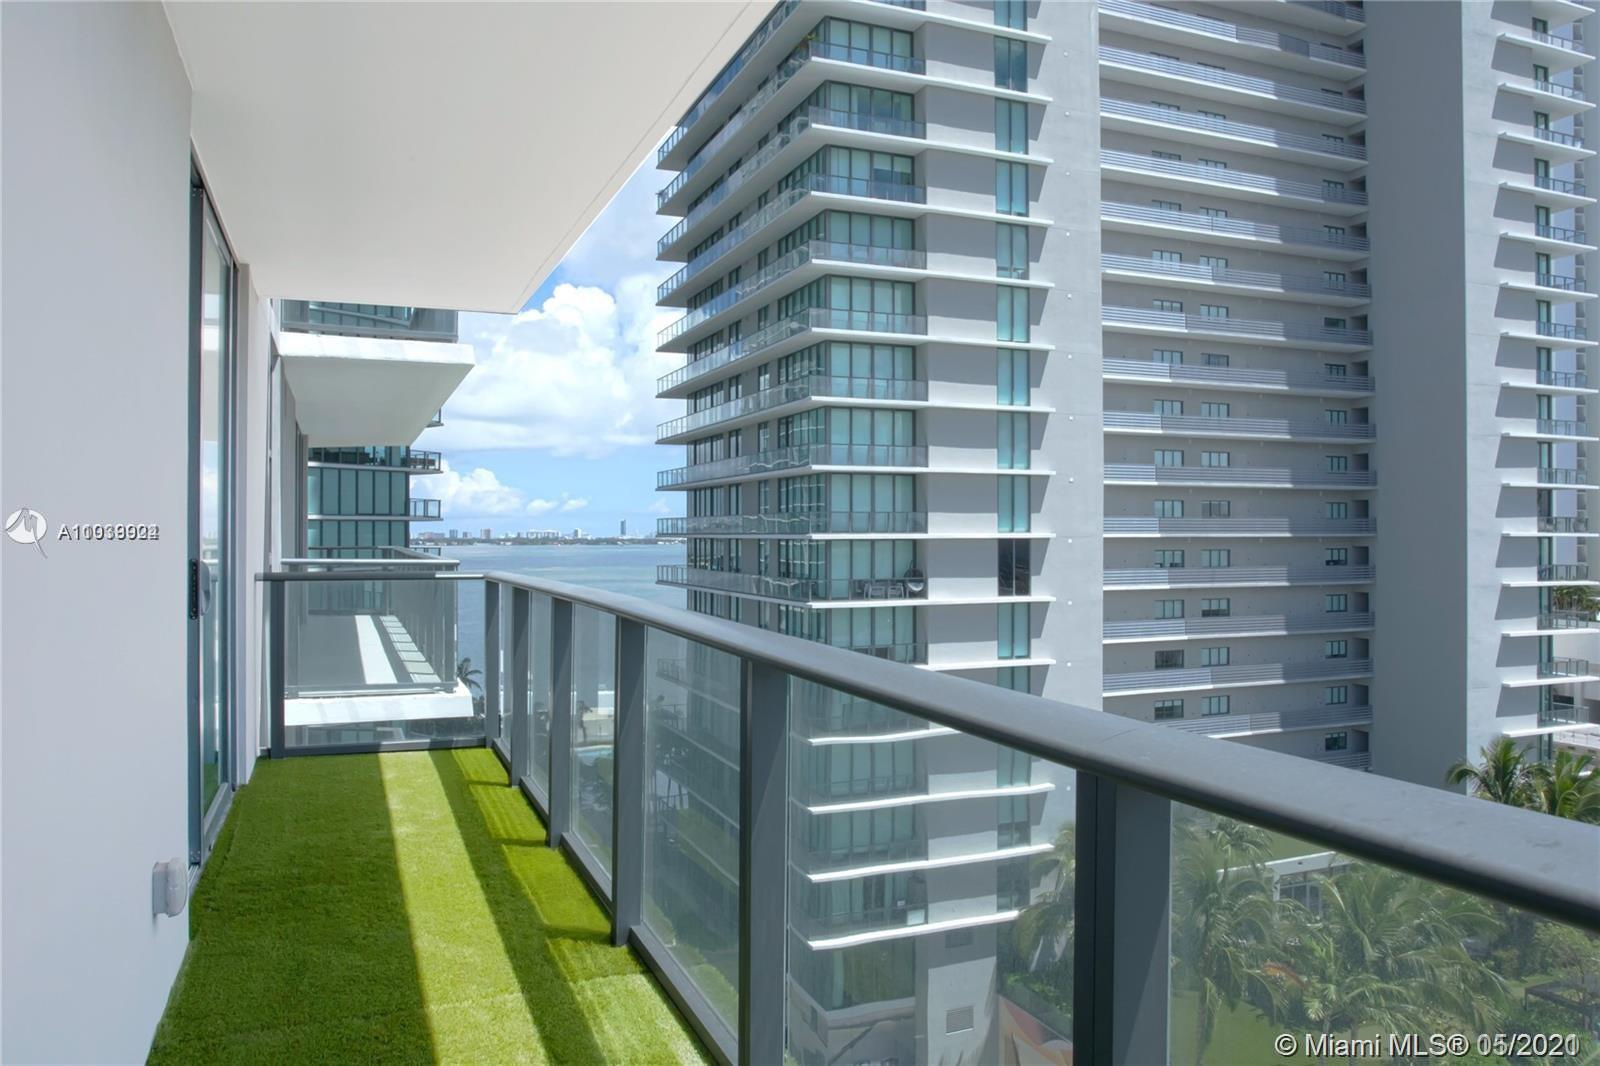 Paraiso Bayviews #1007 - 501 NE 31st St #1007, Miami, FL 33137